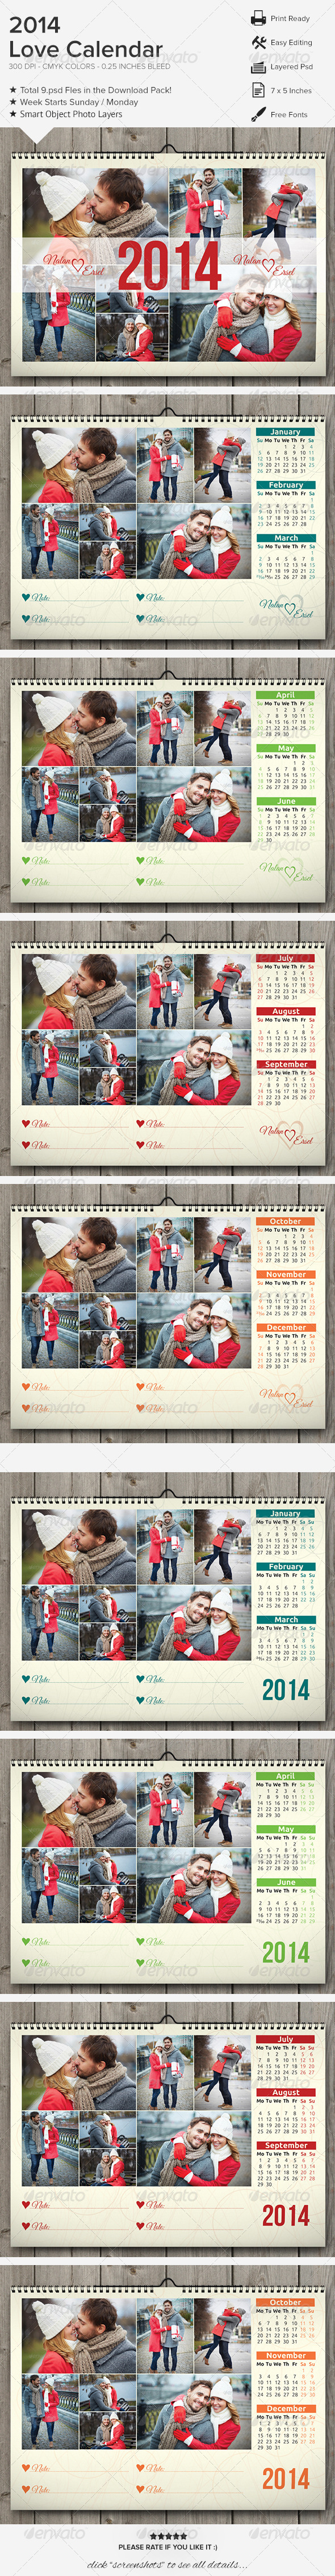 Love Calendar 2014 - Calendars Stationery